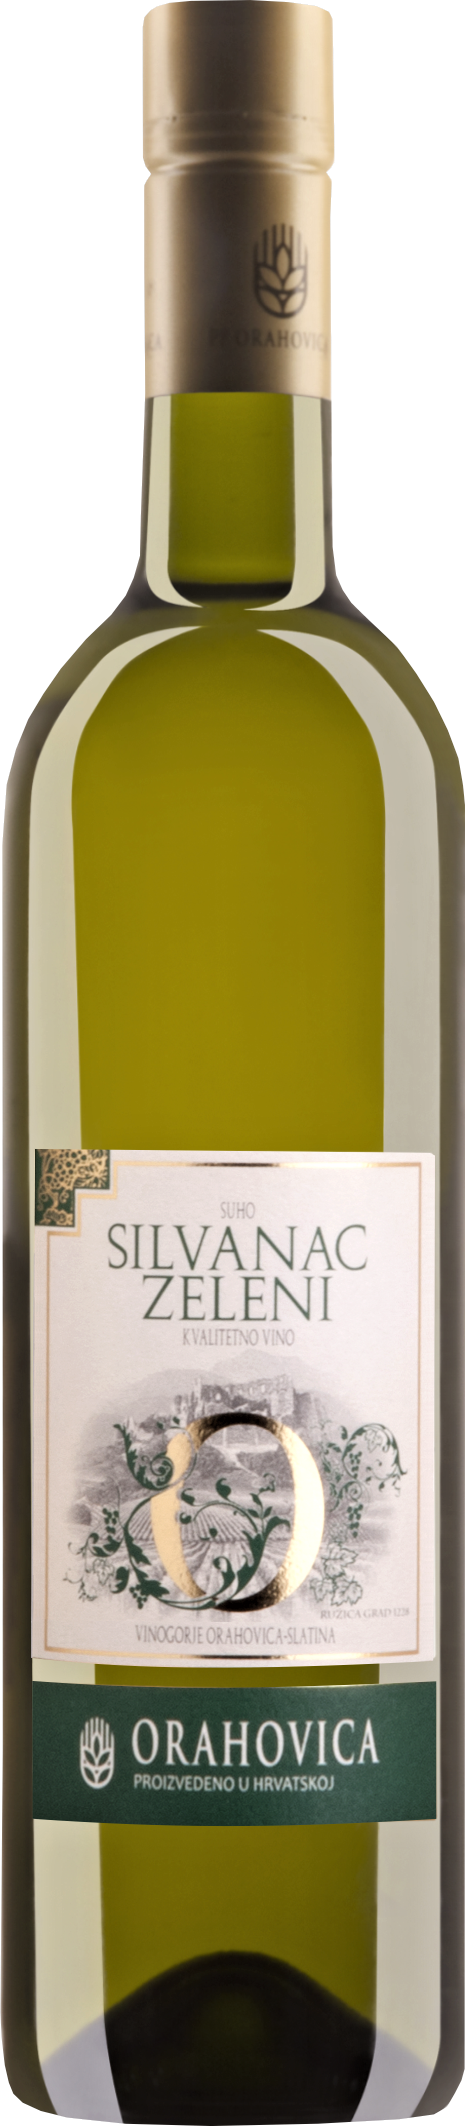 Orahovica - Silvaner - Croacia - 2019